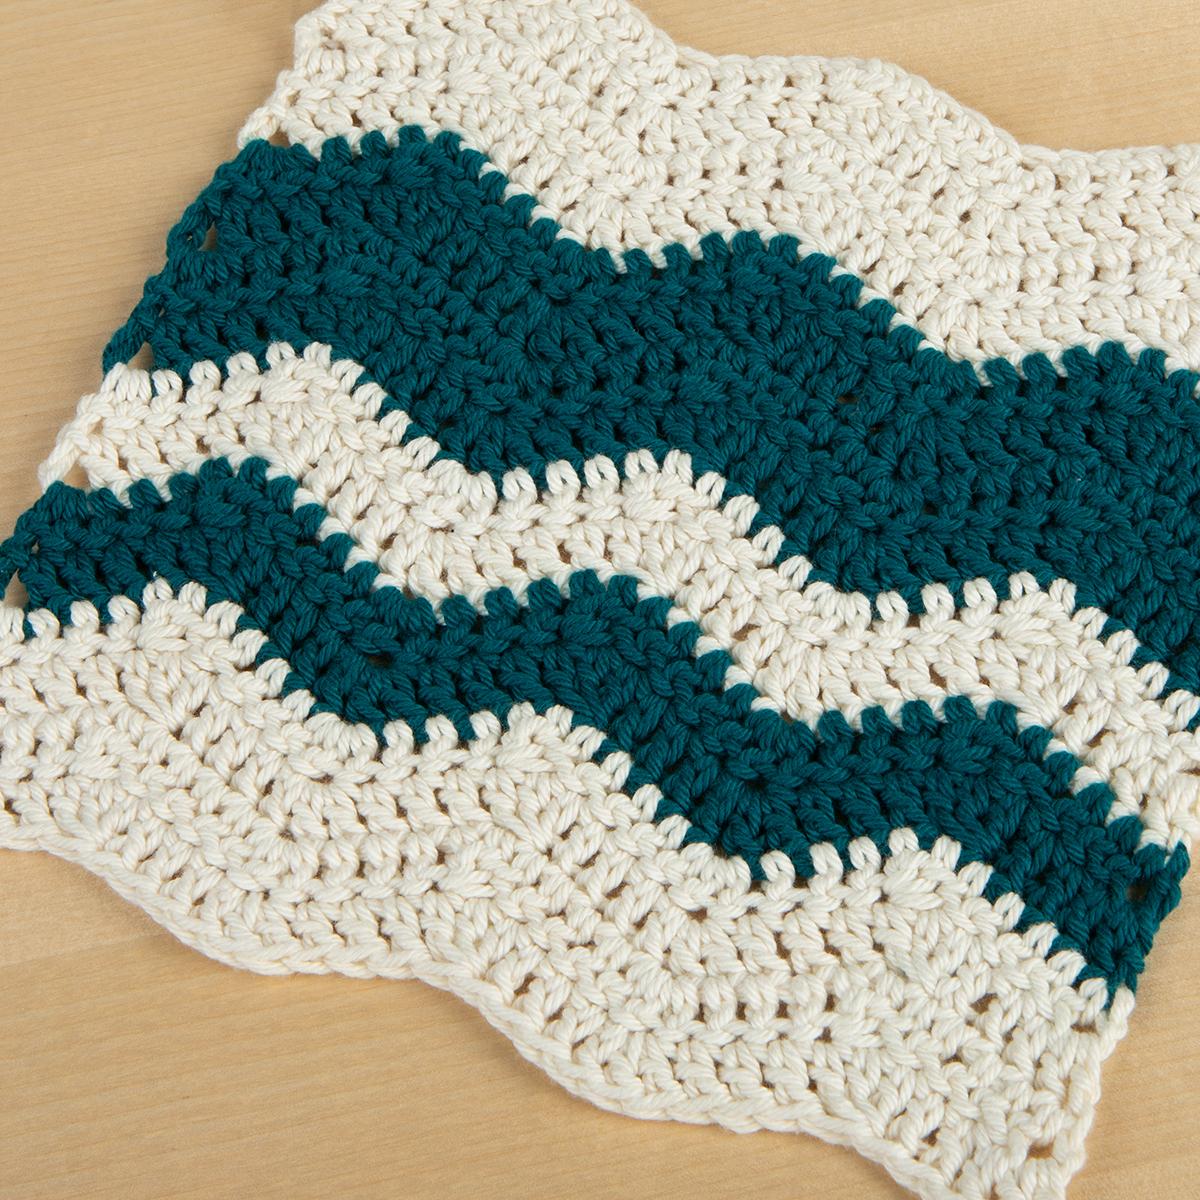 Wavy Chevron Crochet Dishcloth Knitting Patterns And Crochet